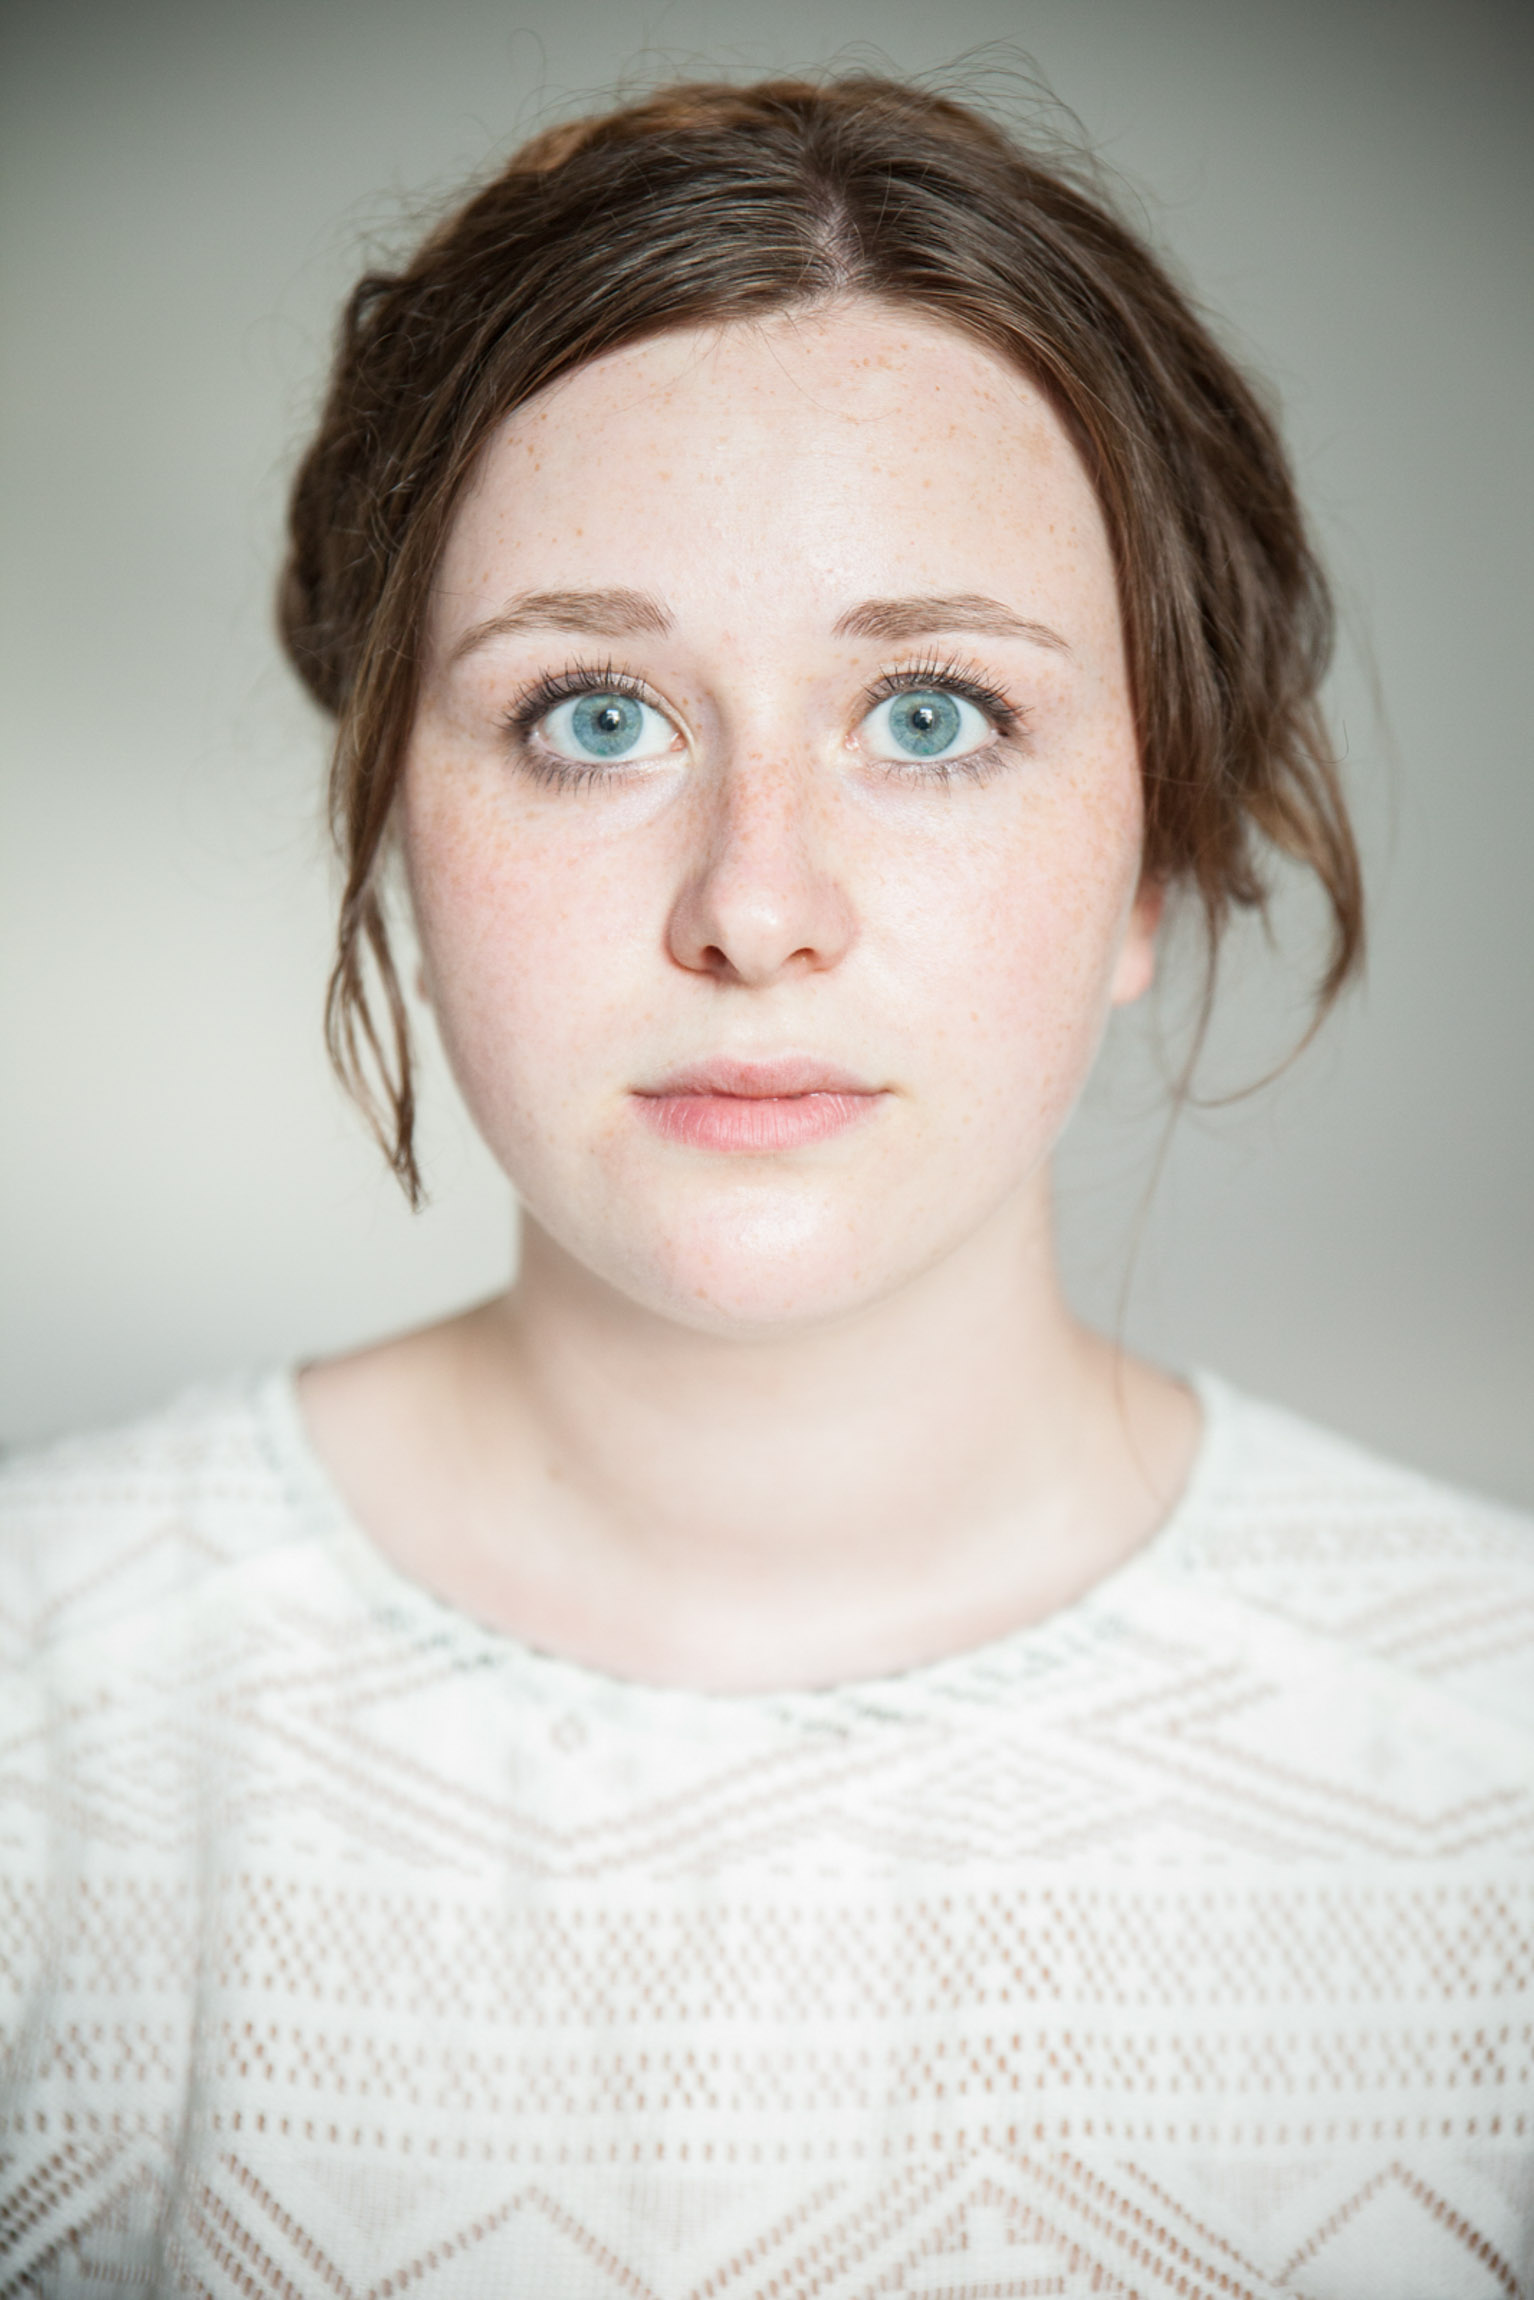 LUKAS KREIBIG Portraits